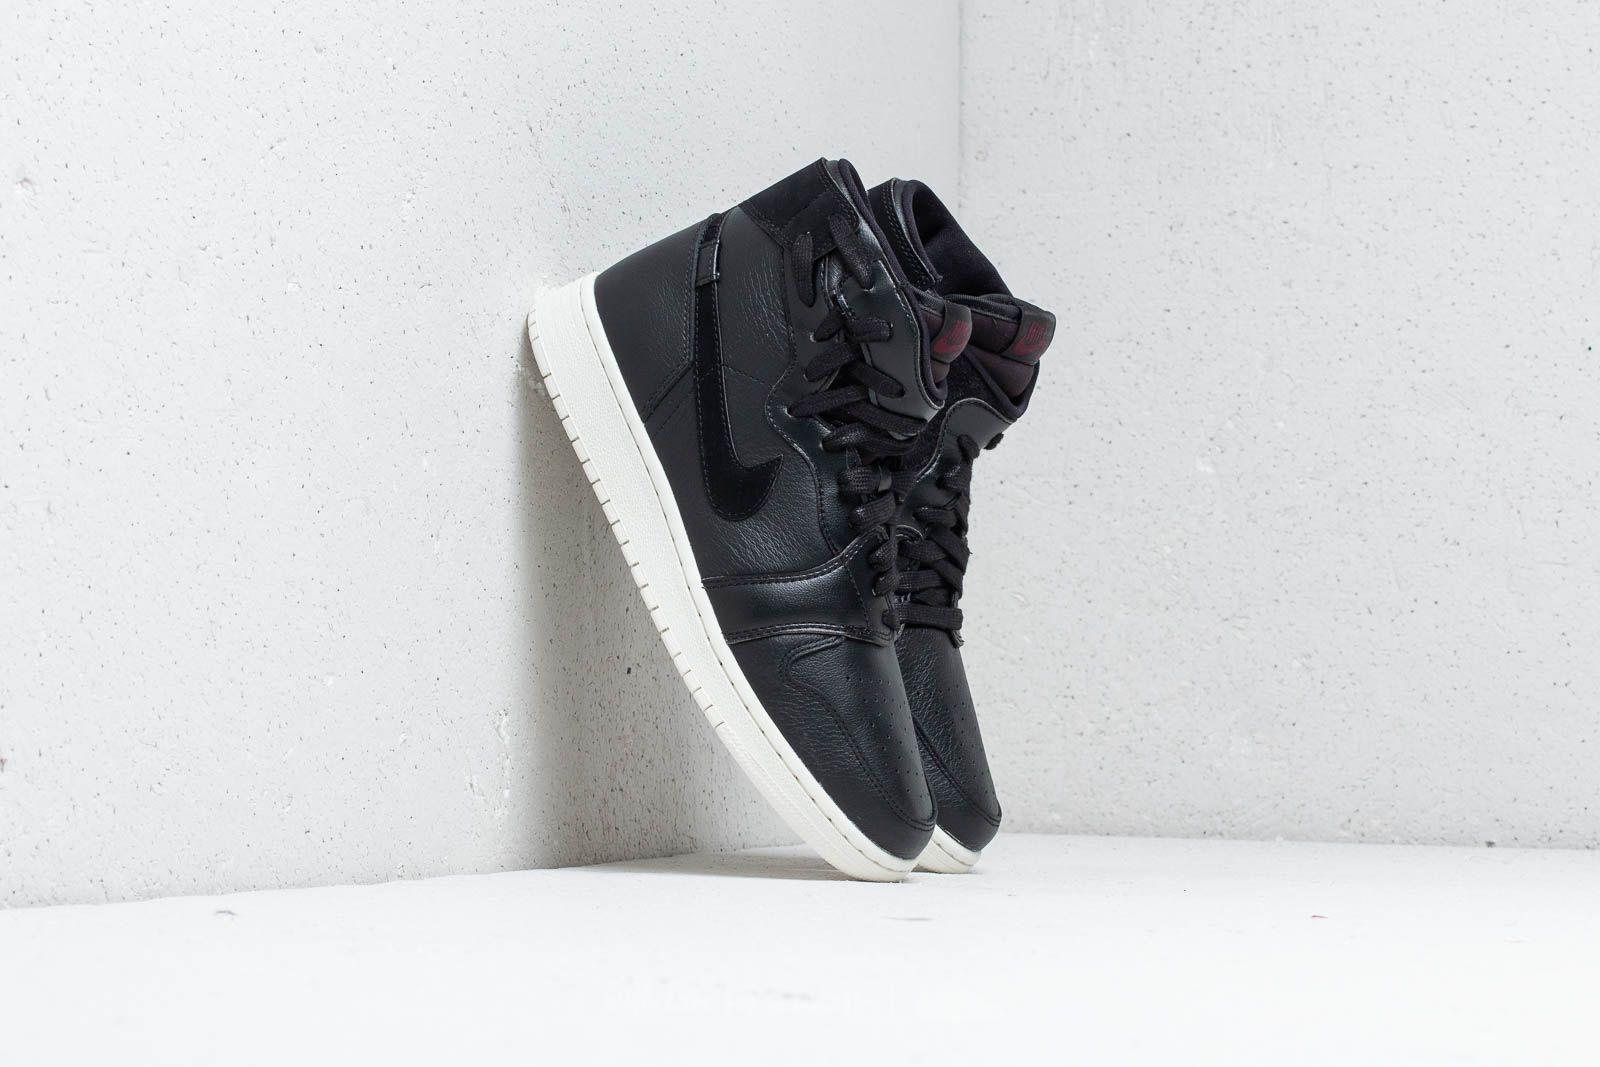 Air Jordan 1 Rebel XX Wmns